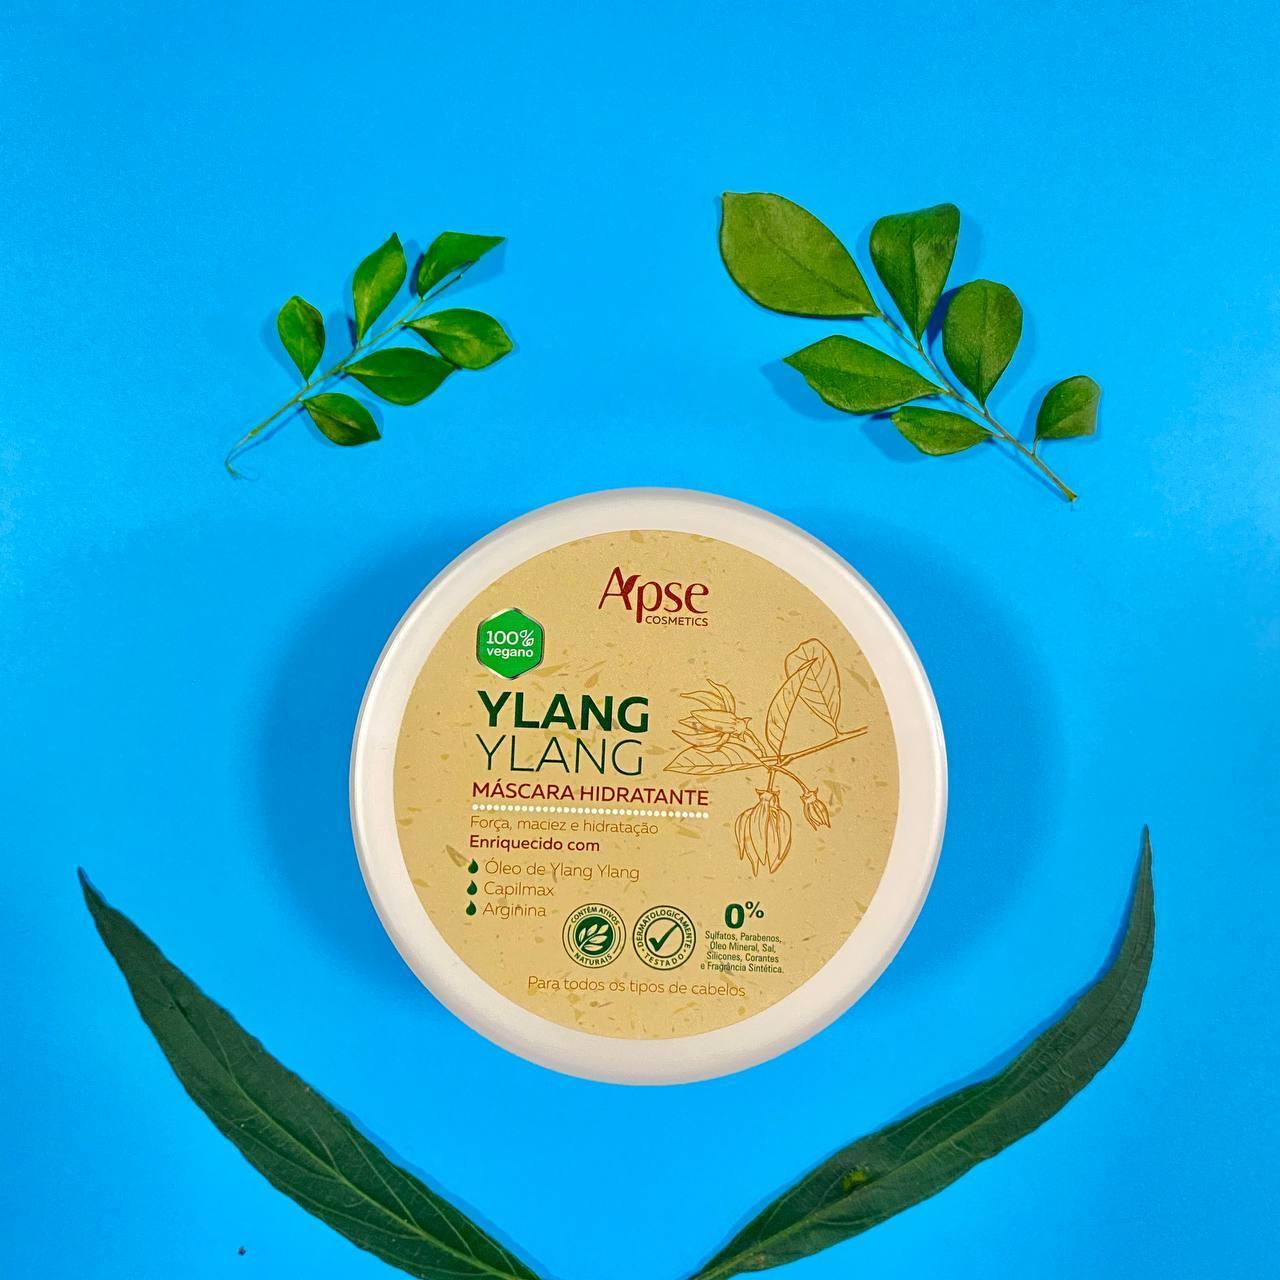 Máscara Hidratante Ylang Ylang - Apse Cosmetics 300g